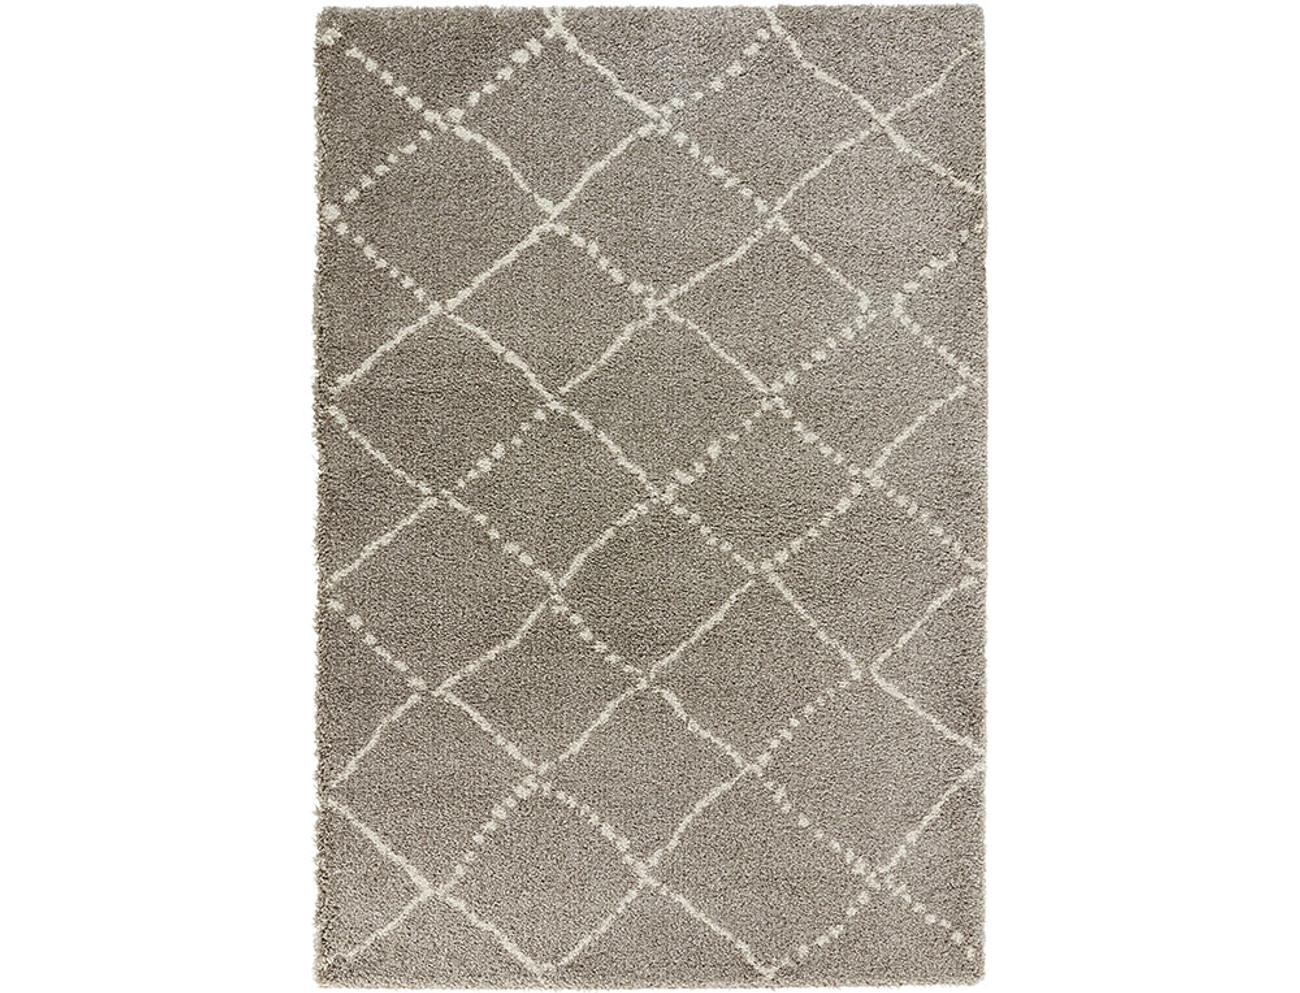 design velours teppich hochflor hash grau creme teppiche hochflor teppiche. Black Bedroom Furniture Sets. Home Design Ideas